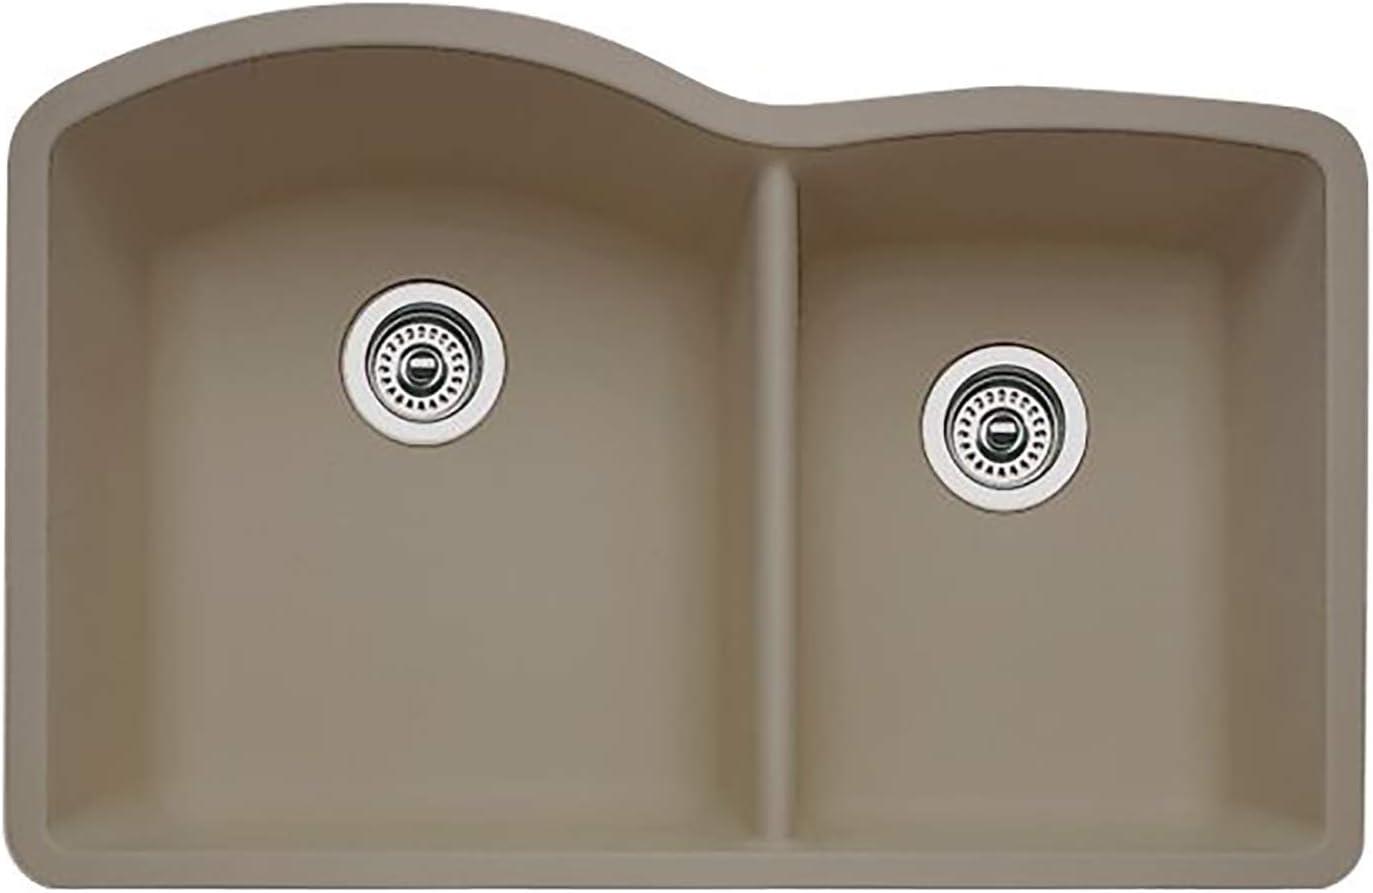 Blanco Truffle 441284 Diamond Silgranit 60 40 Double Bowl Undermount Kitchen Sink 32 X 21 Sink Strainers Amazon Com